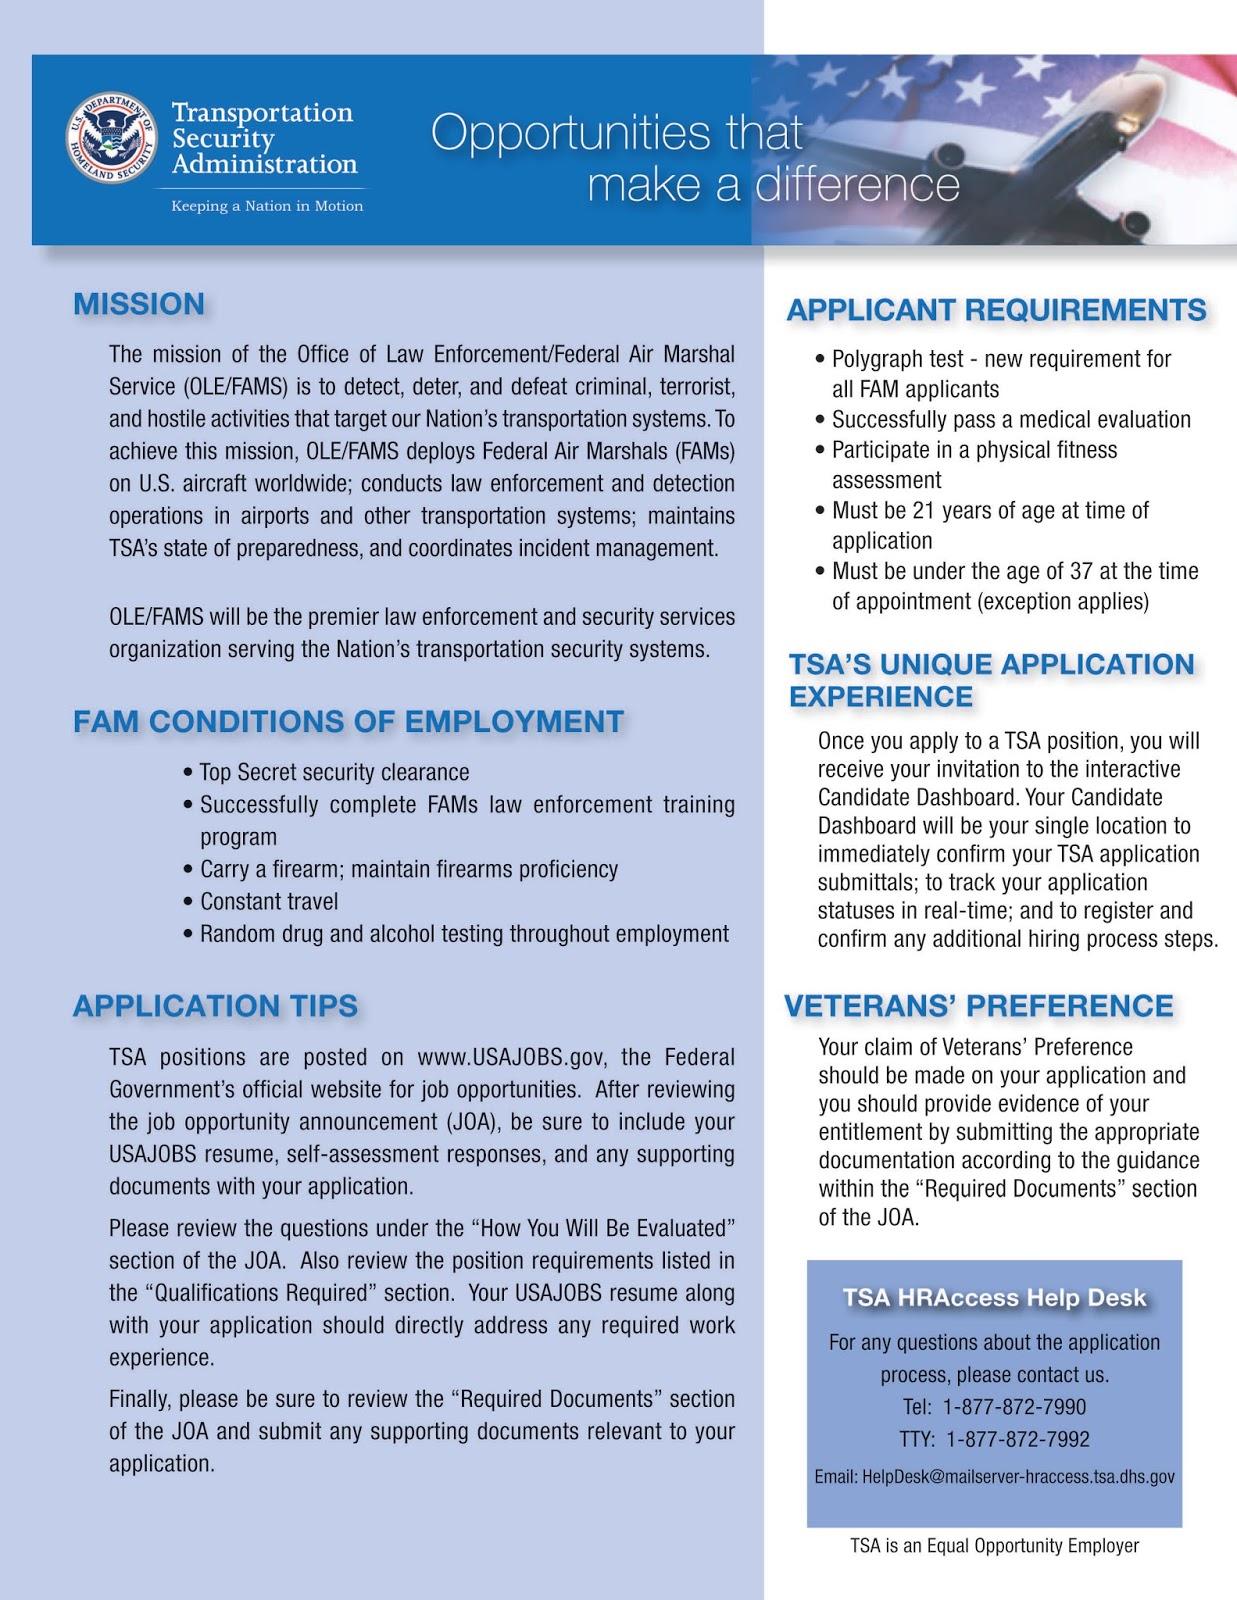 TSA Is Hiring Federal Air Marshals  Application Opens Jan 11